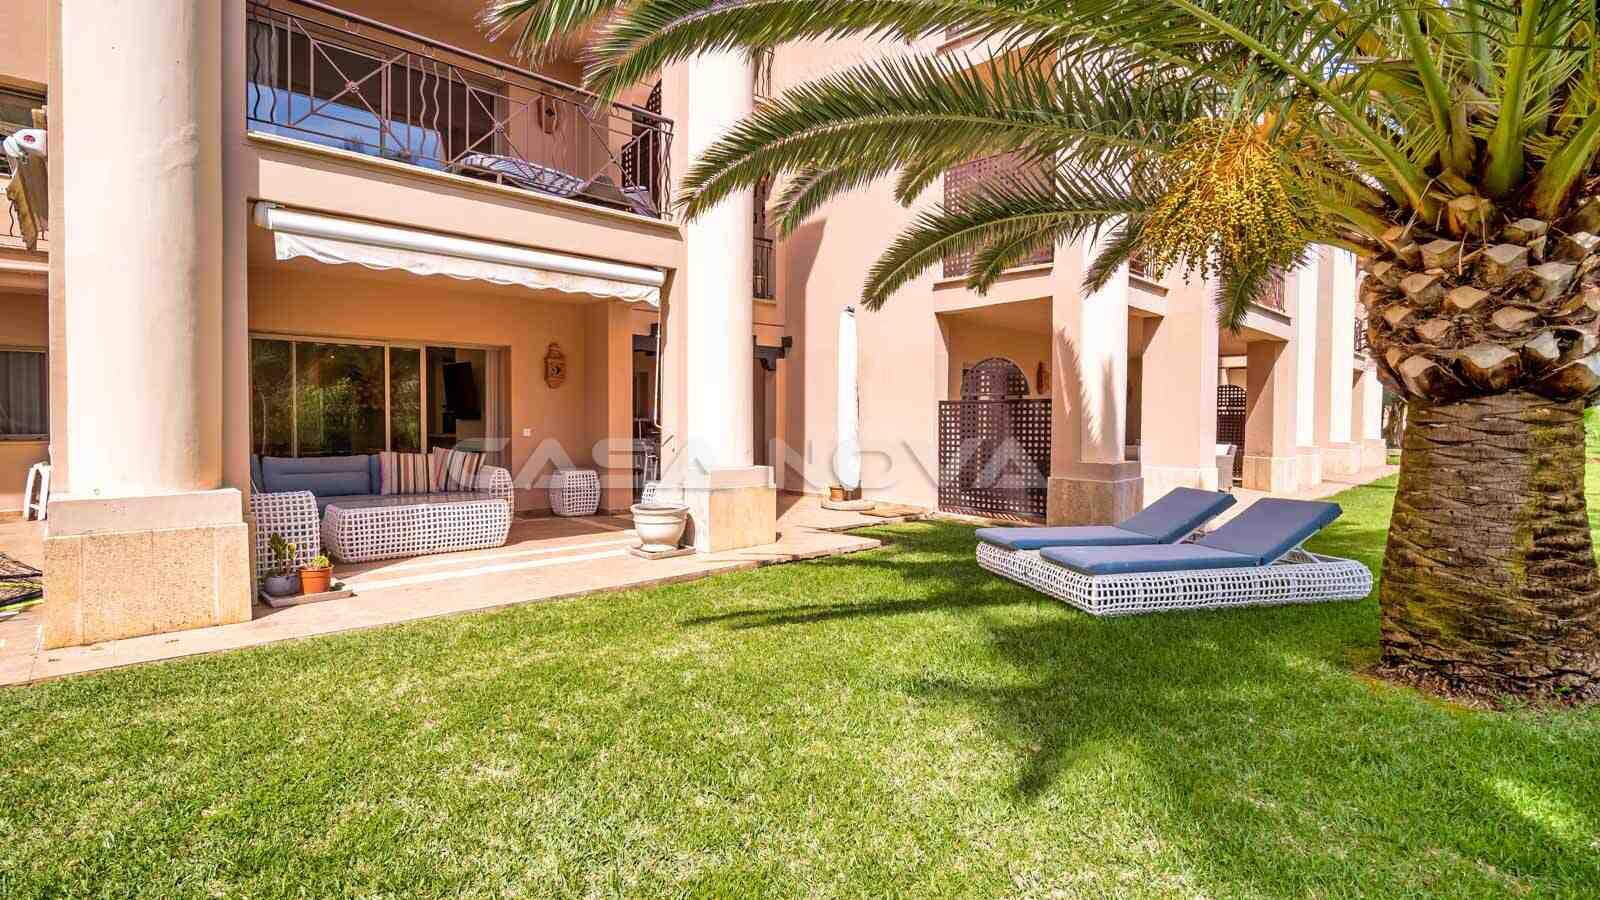 Mallorca Apartment mit gepflegtem Garten